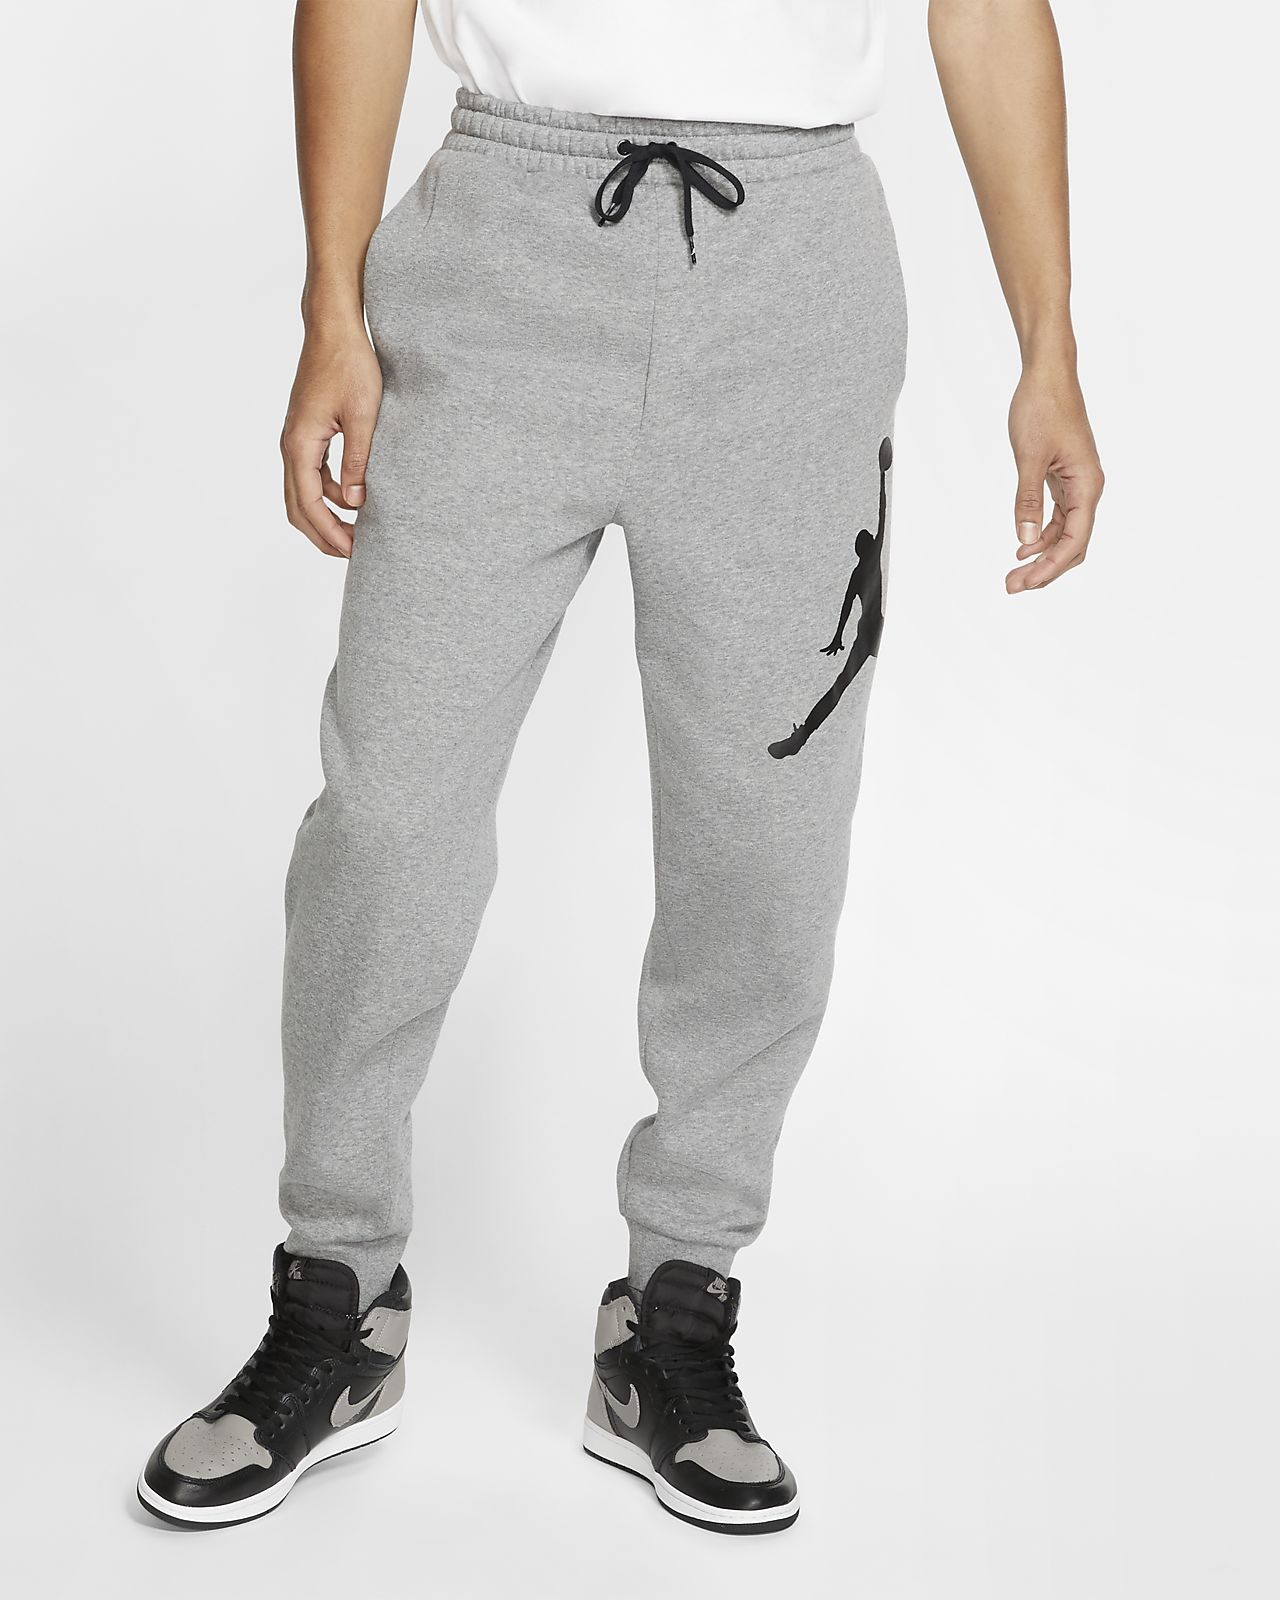 Pantalones de tejido Fleece para hombre Jordan Jumpman Logo